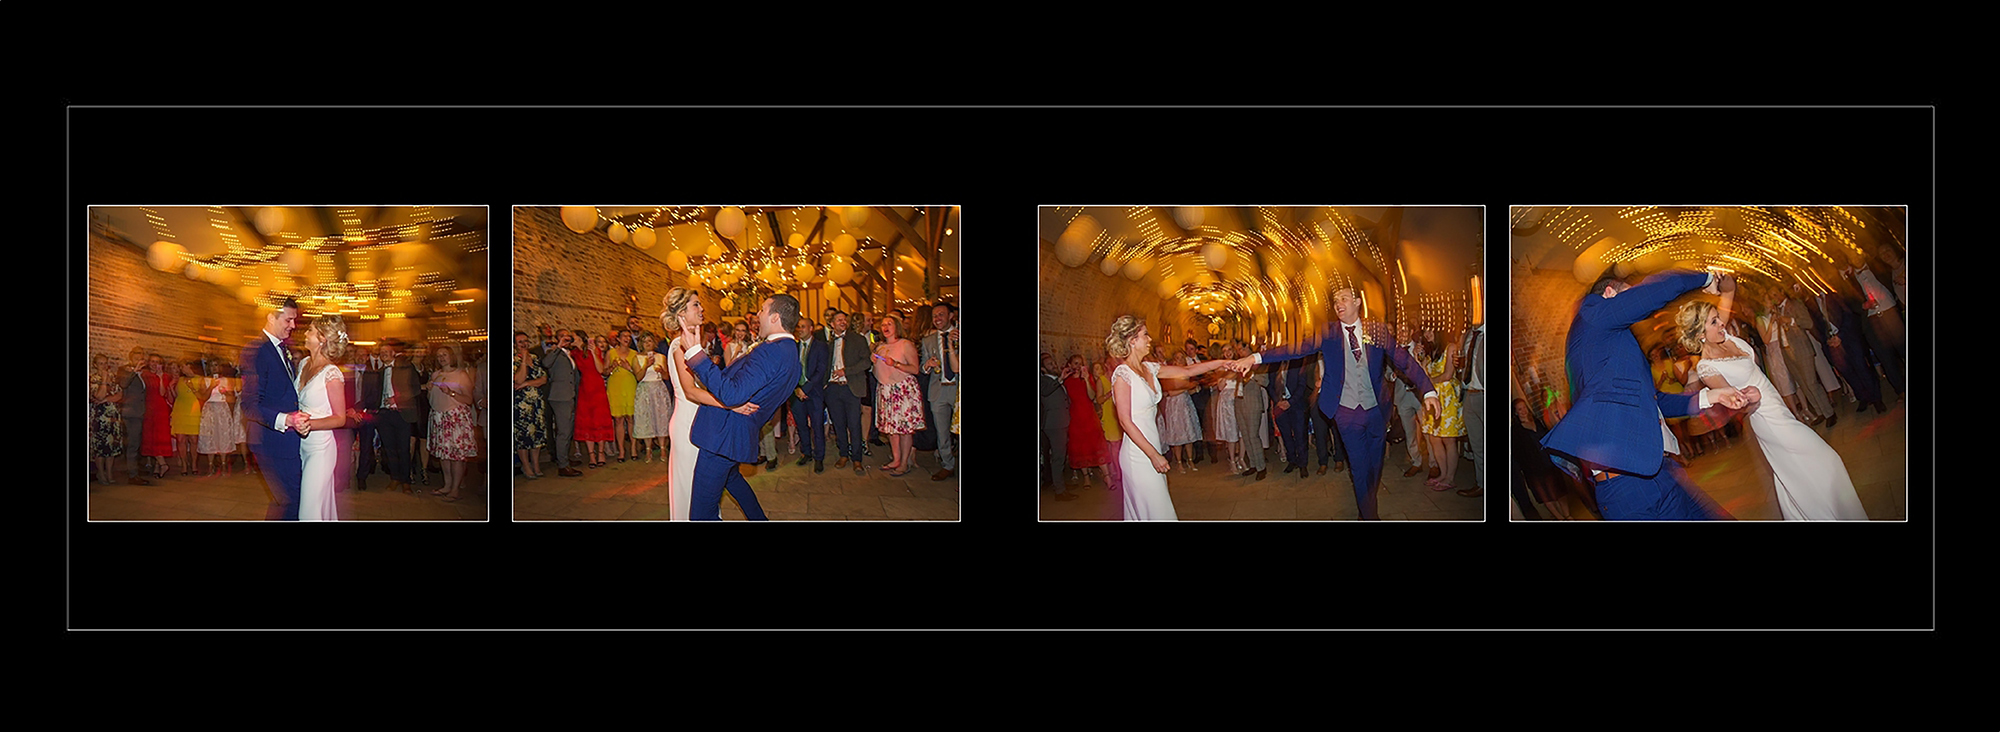 KHP_wedding-album-dancing.jpg#asset:2839